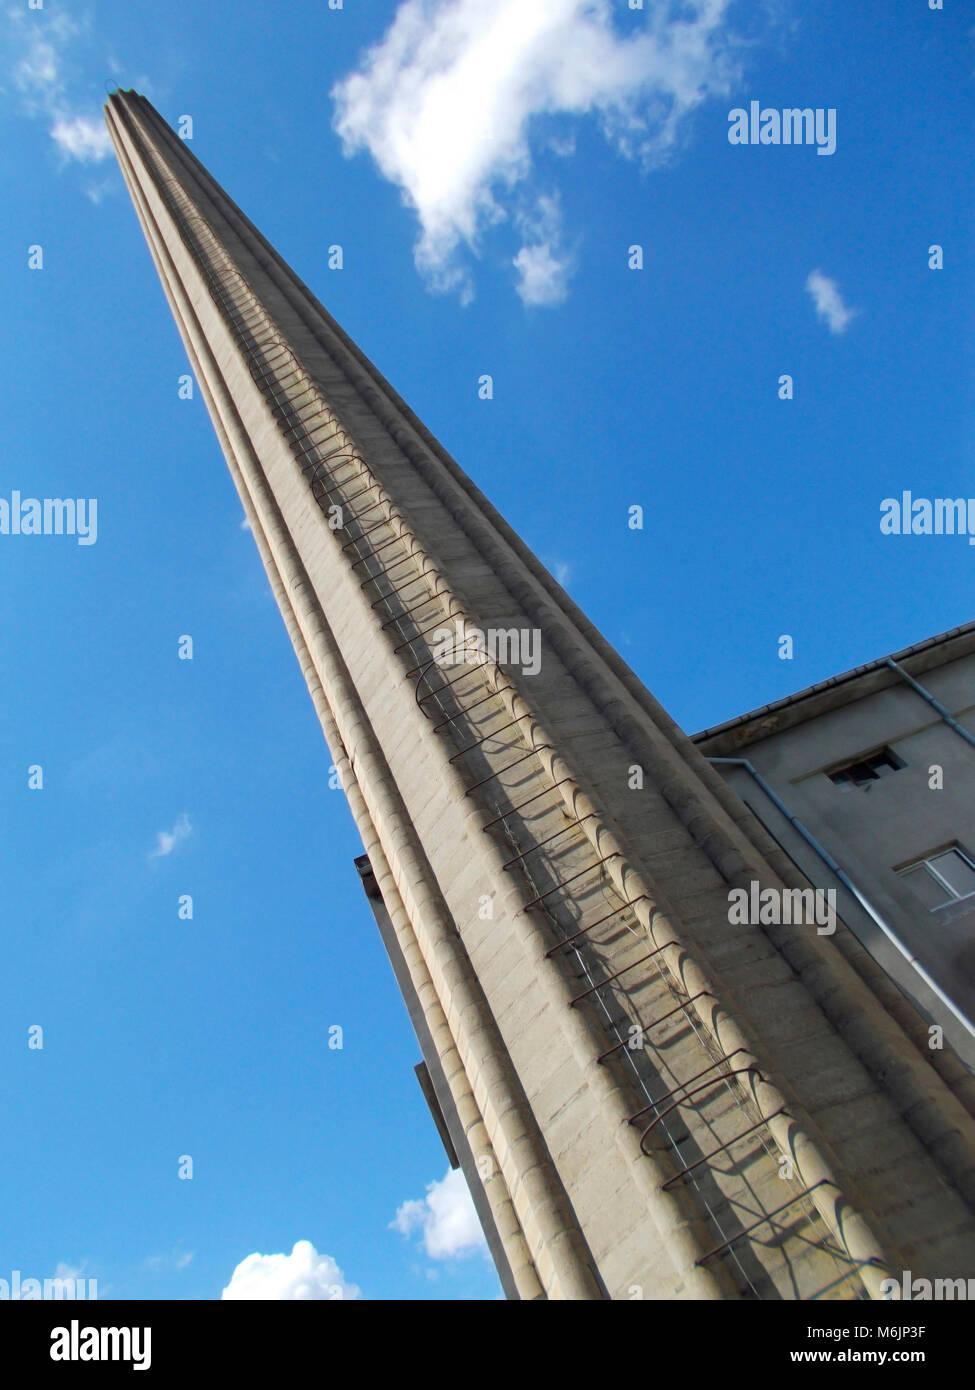 Chimney stack, Ladder, Path upwards, Sky, Diagonal - Stock Image